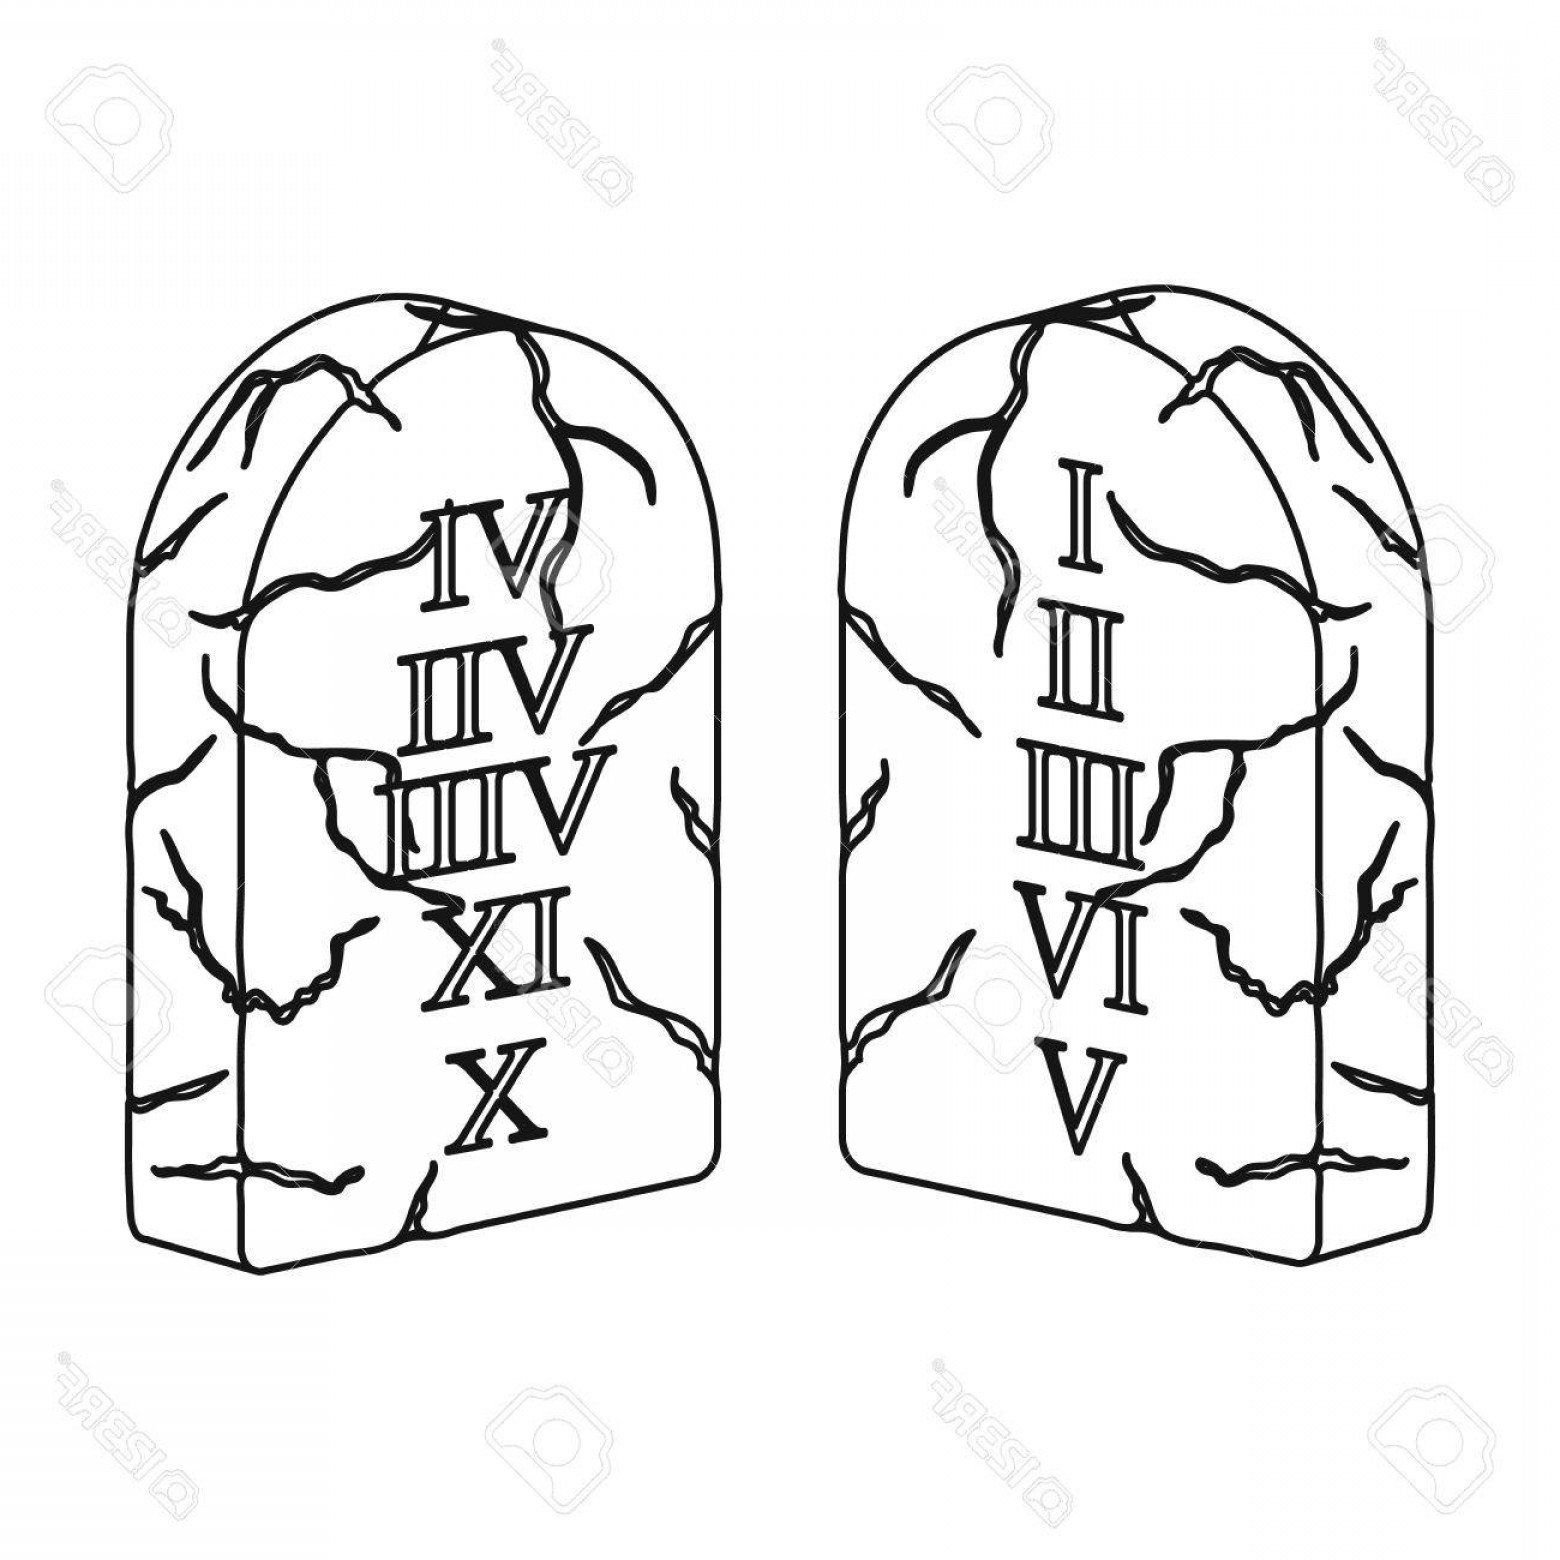 Ten commandments clipart drawing.  free download best